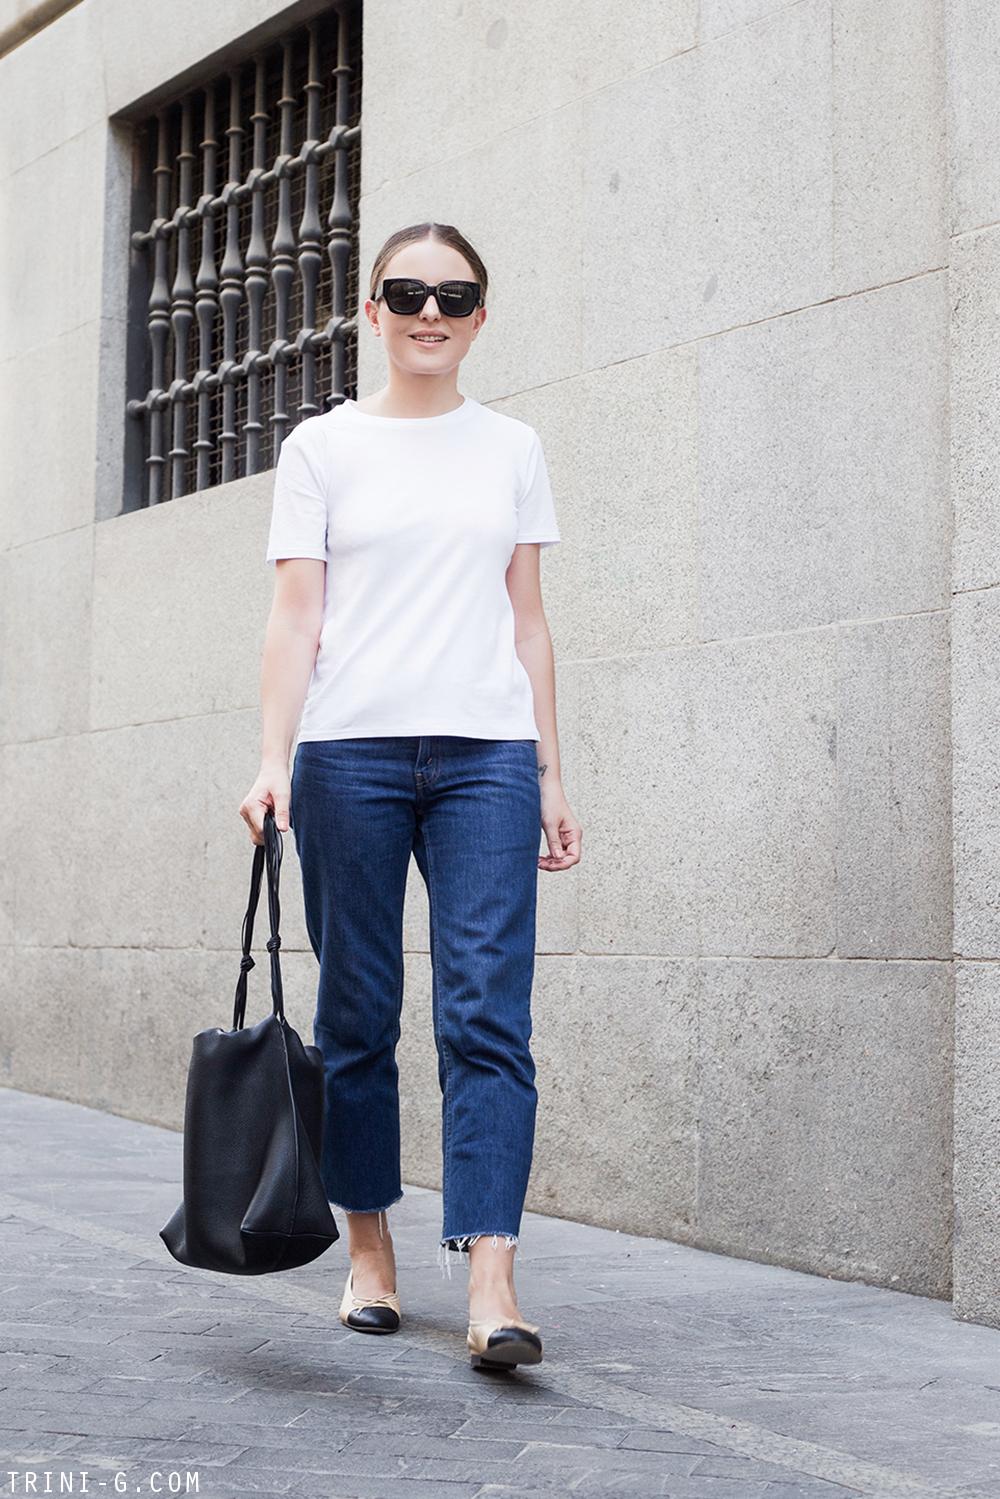 Trini  The Row t-shirt Levis jeans